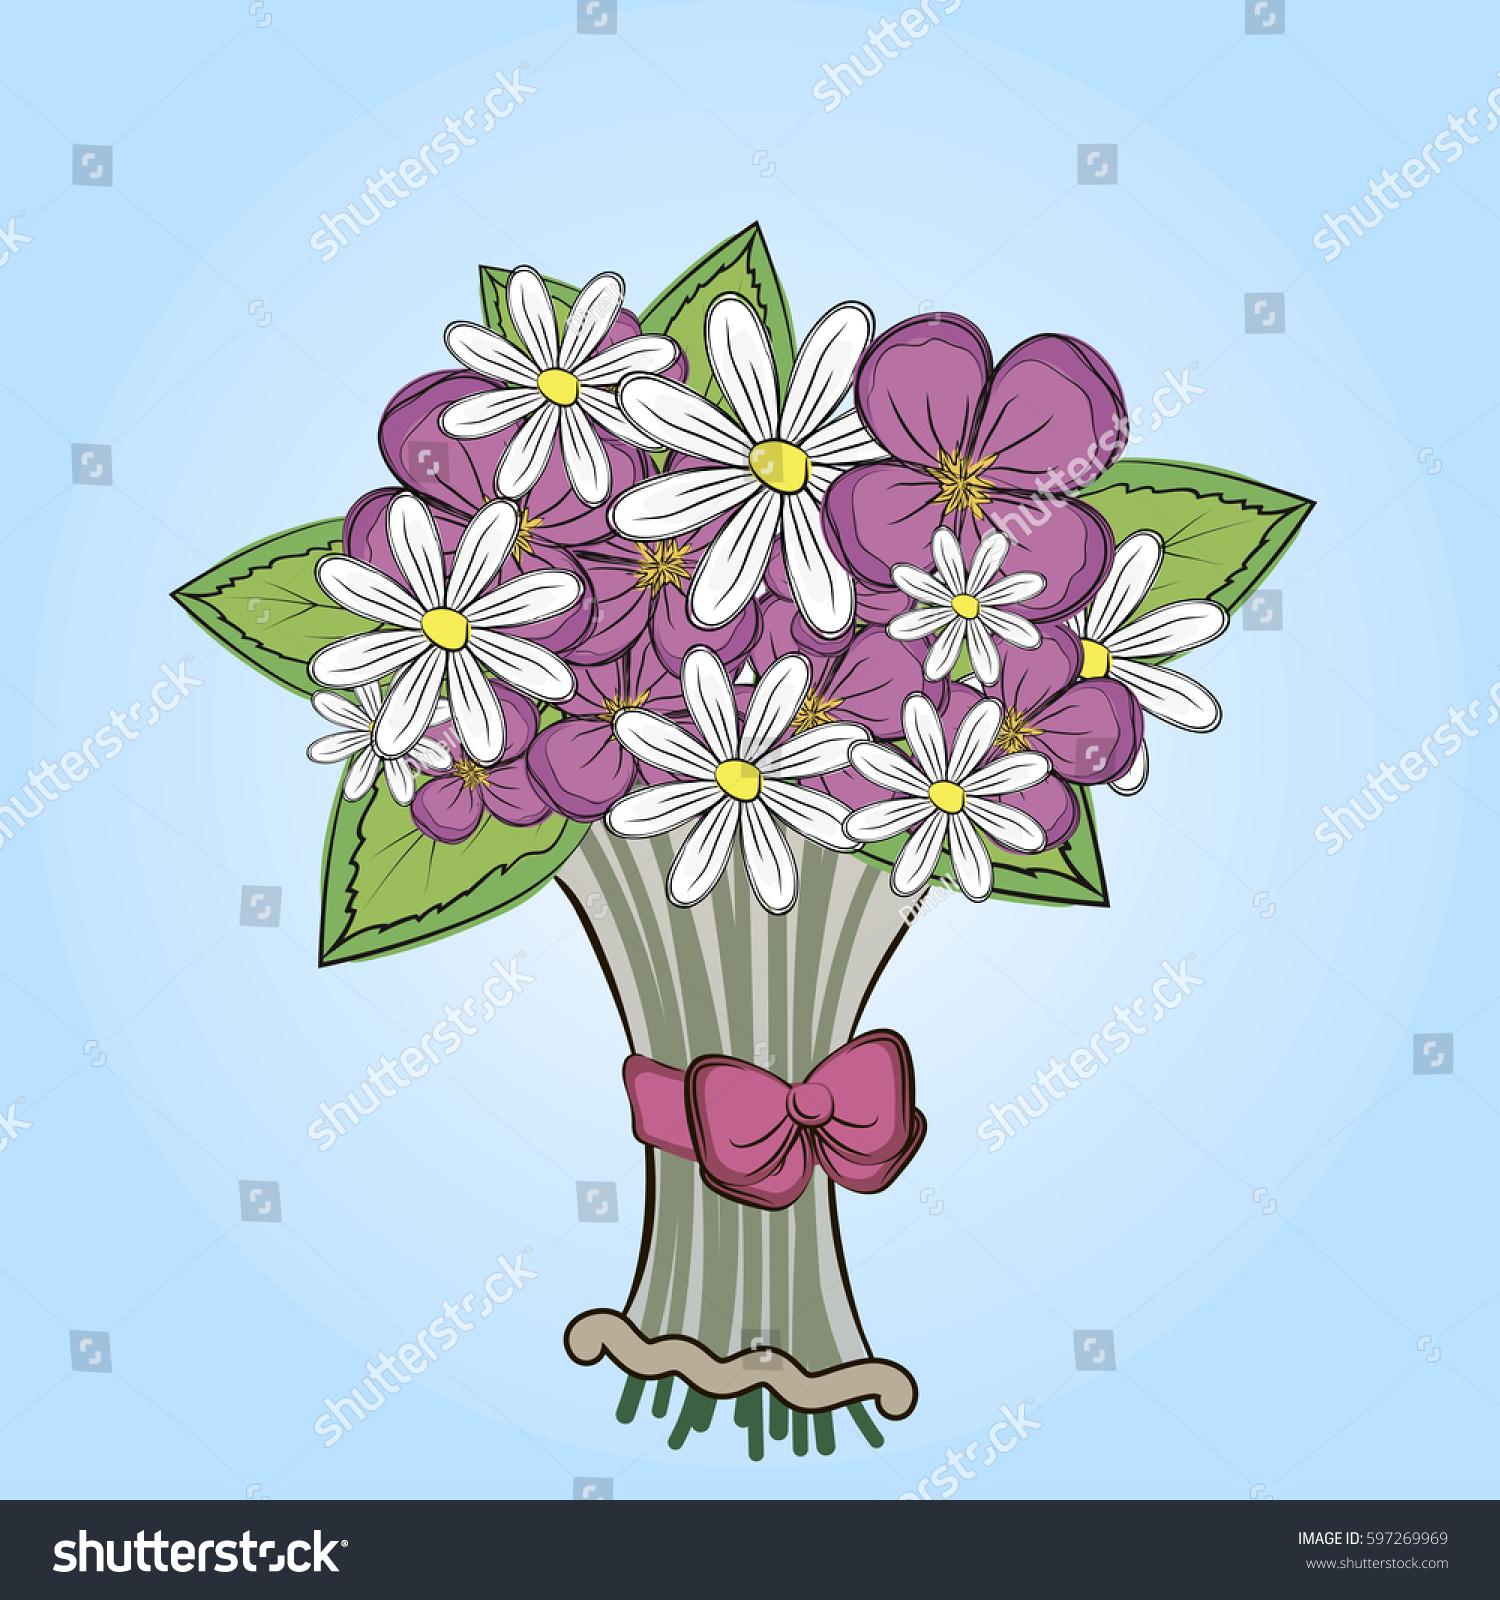 Card Cute Bouquet Flowers Vector Illustration Stock Vector (Royalty ...